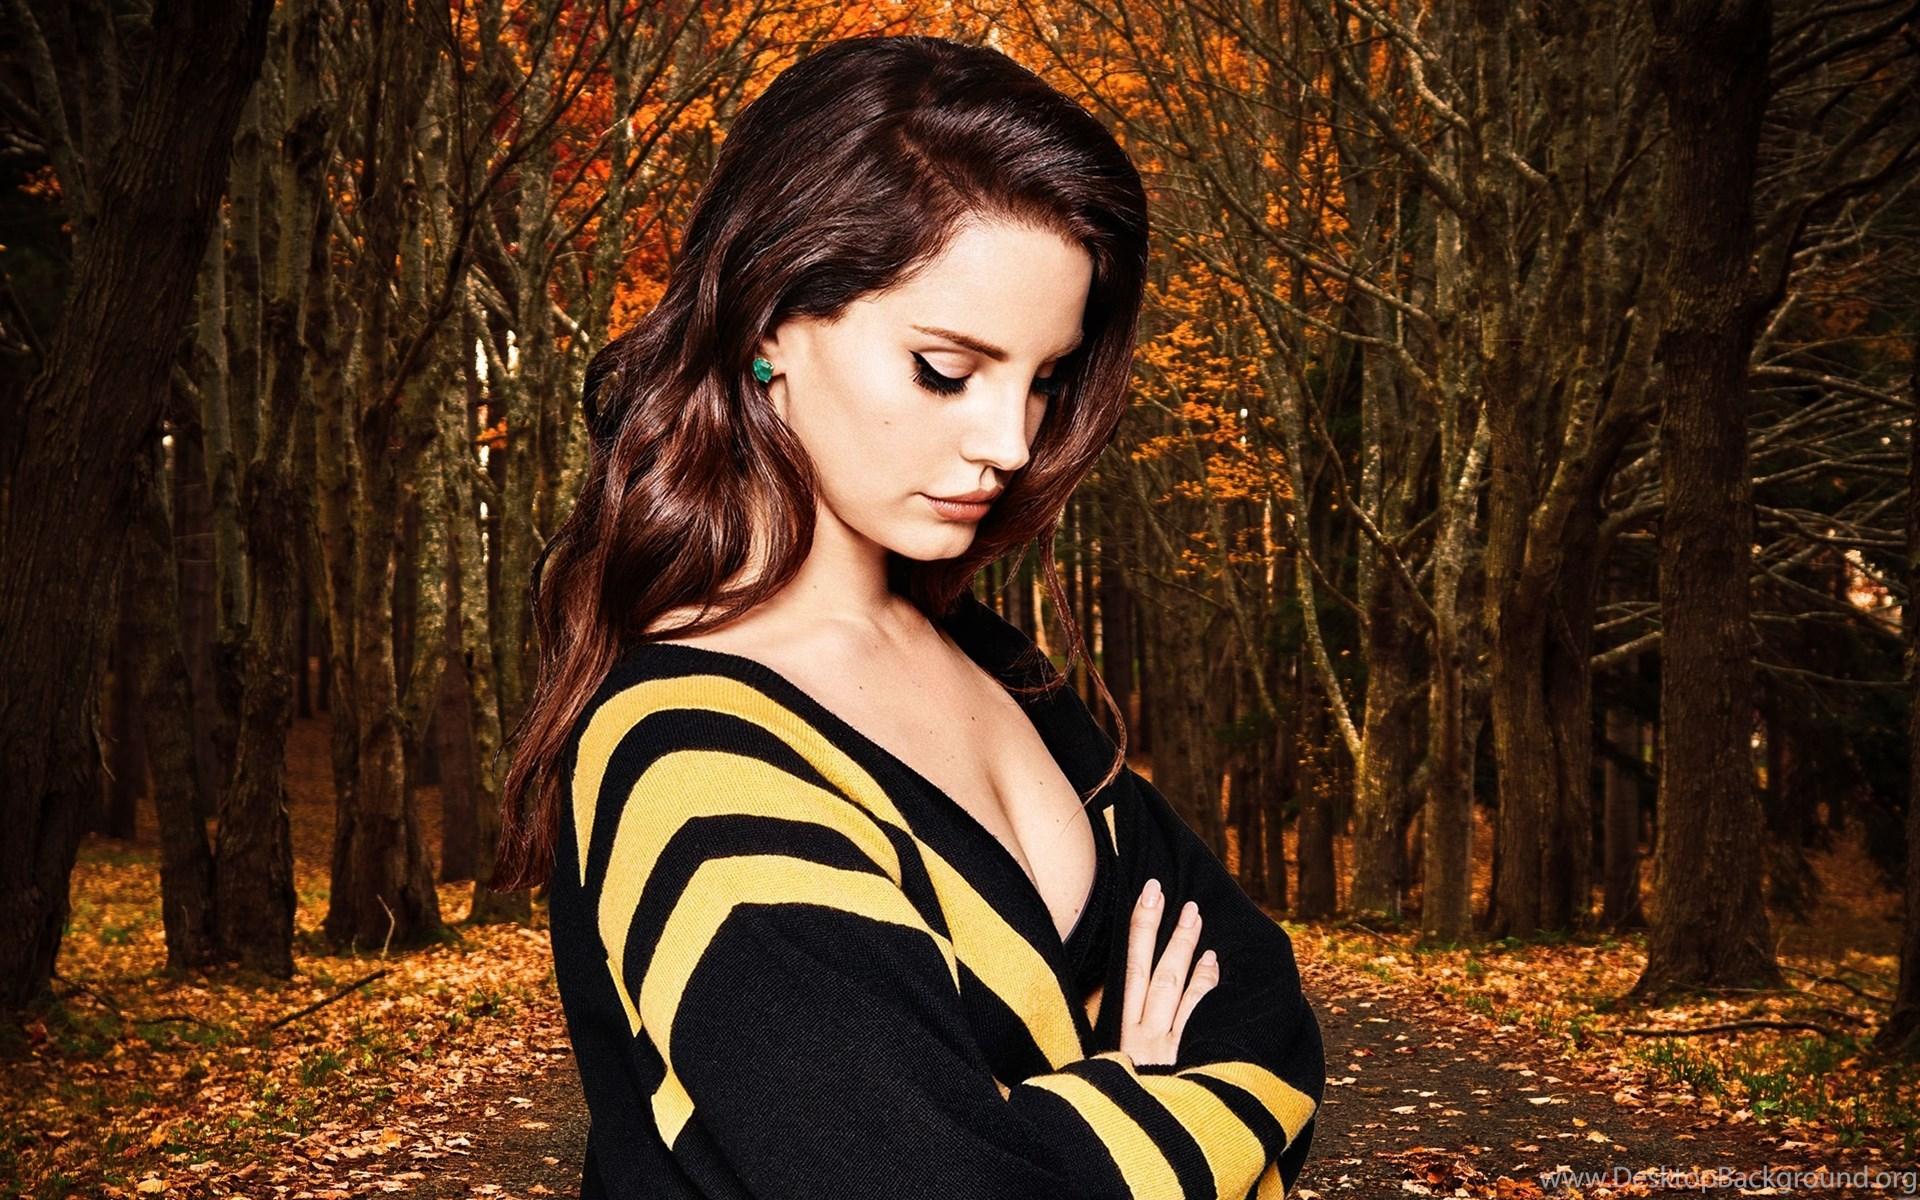 Lana Del Rey Wallpapers Hd By Maarcopngs On Deviantart Desktop